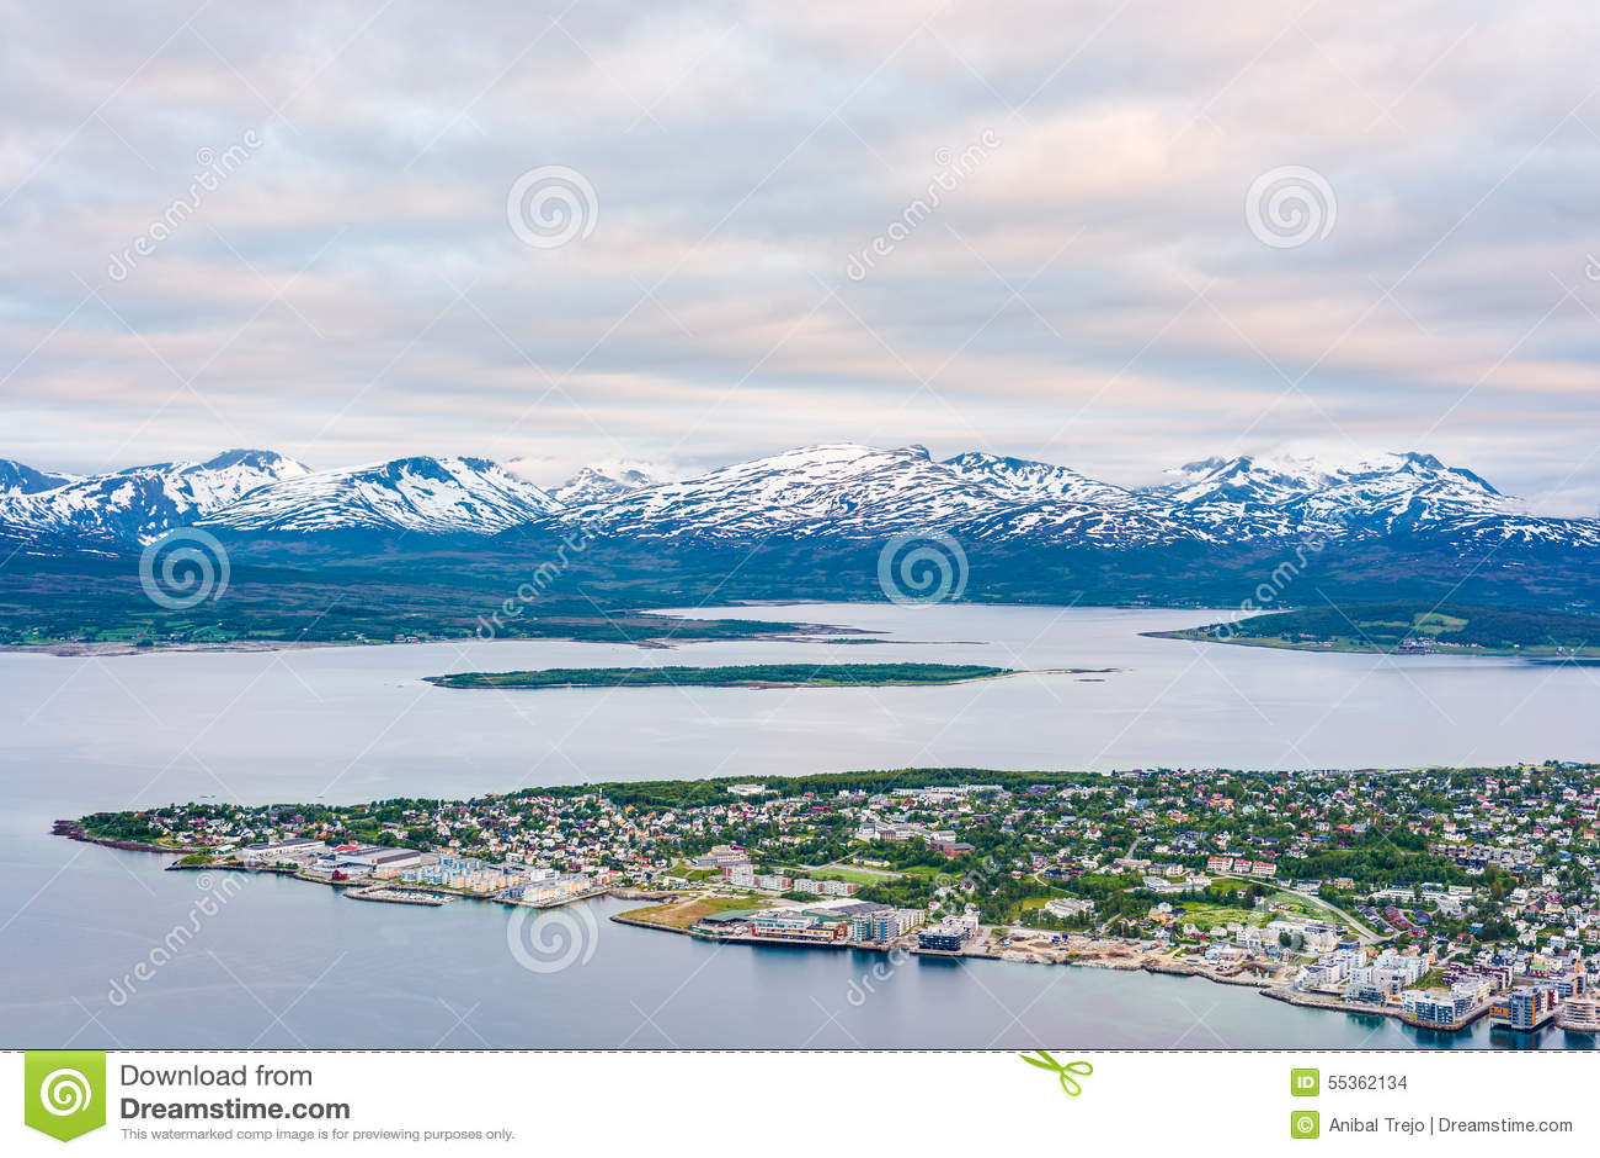 Tromso come visto dal supporto Storsteinen, Norvegia